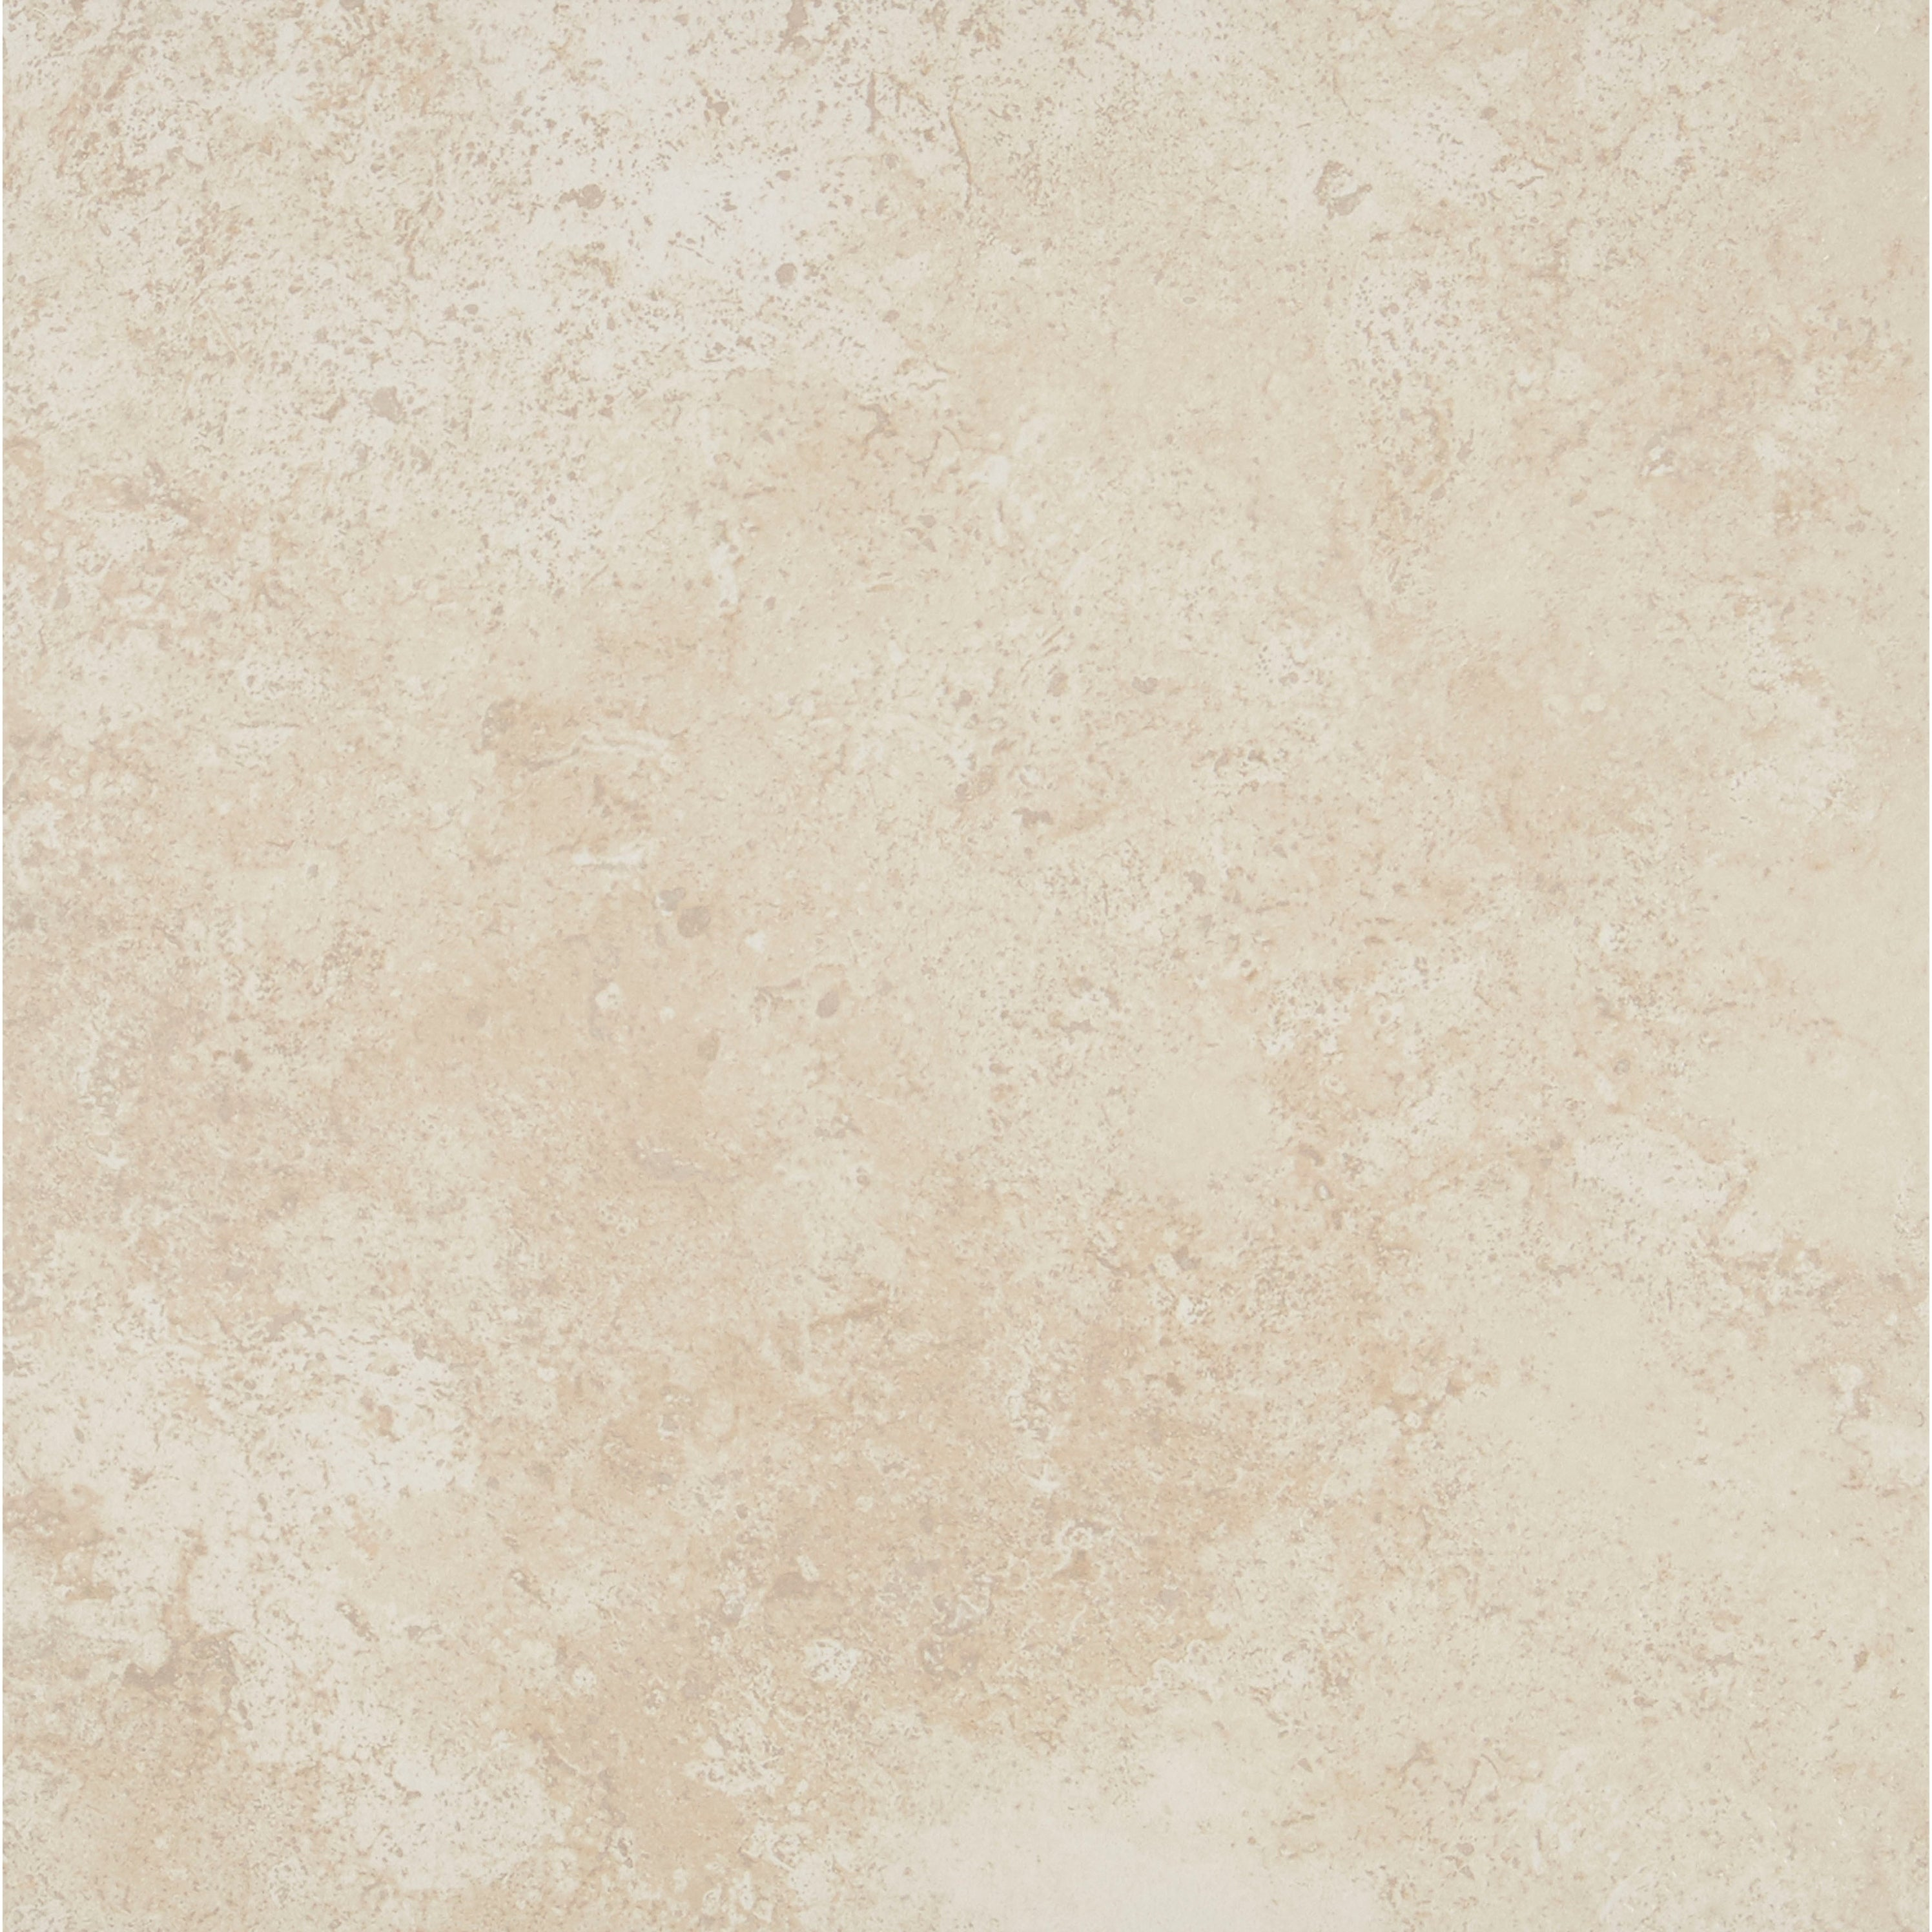 Shop Travertine Replica 18x18 Inch Ceramic Floor Tile In Alabaster